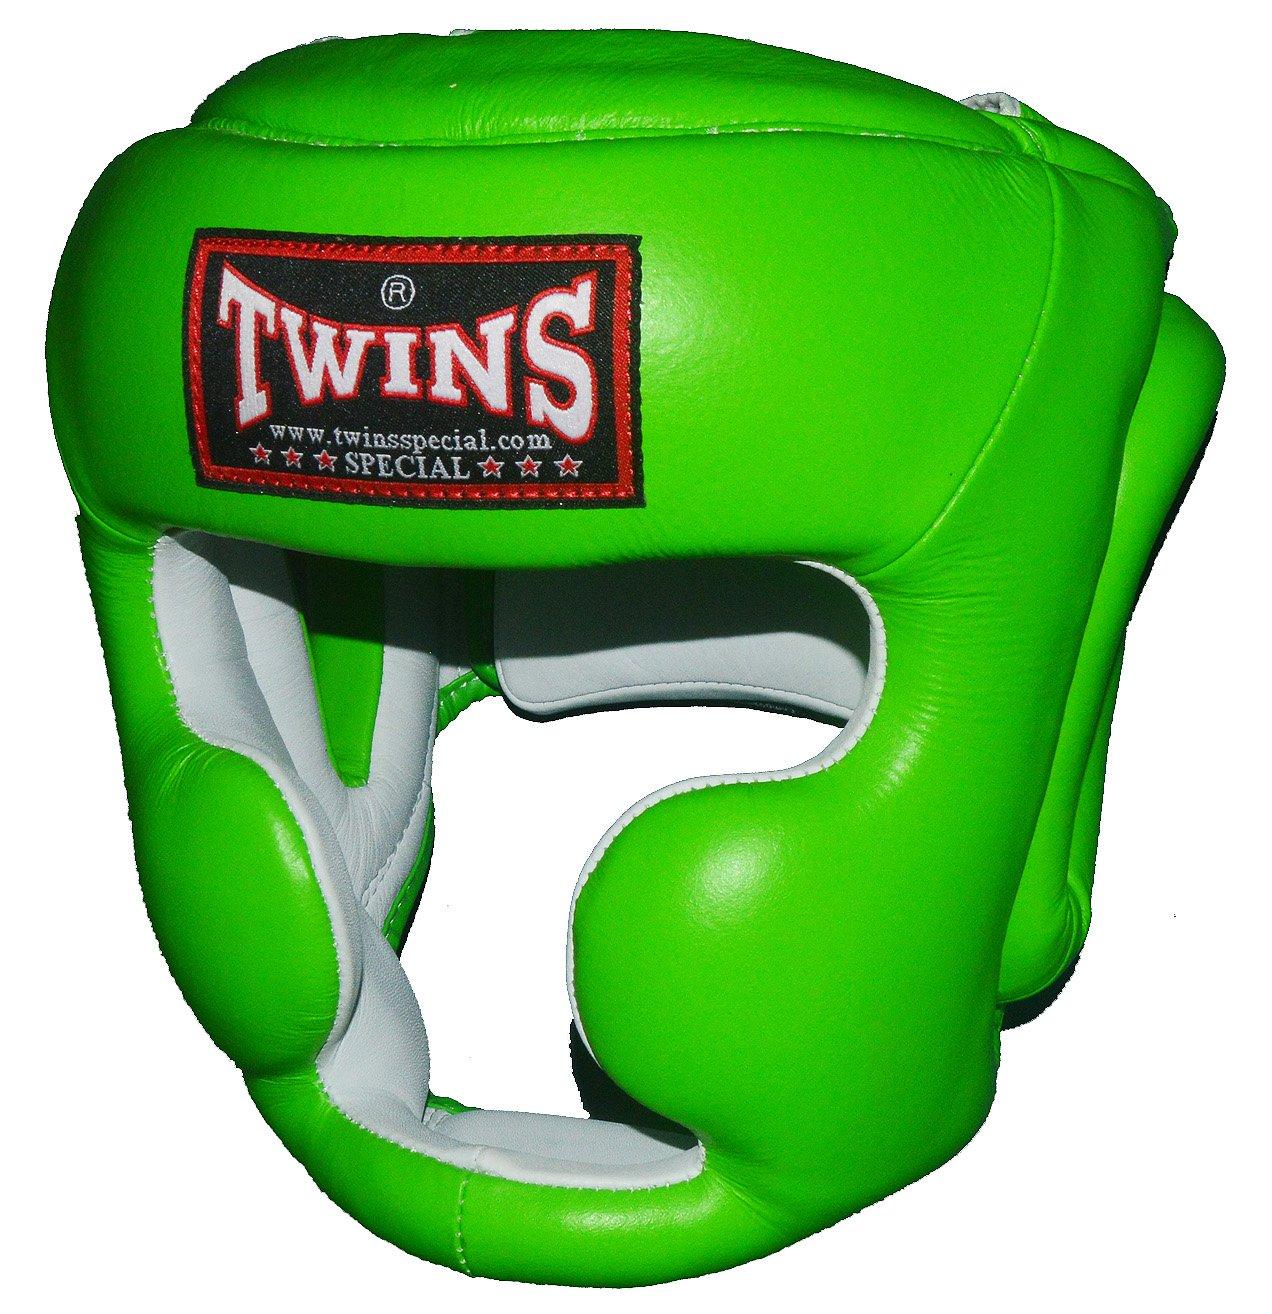 TWINS本革製ヘッドガード ライムグリーン PTTW3190 キッズサイズあり/トップファイター トレーニング映像付 B075D8PR2R  Small